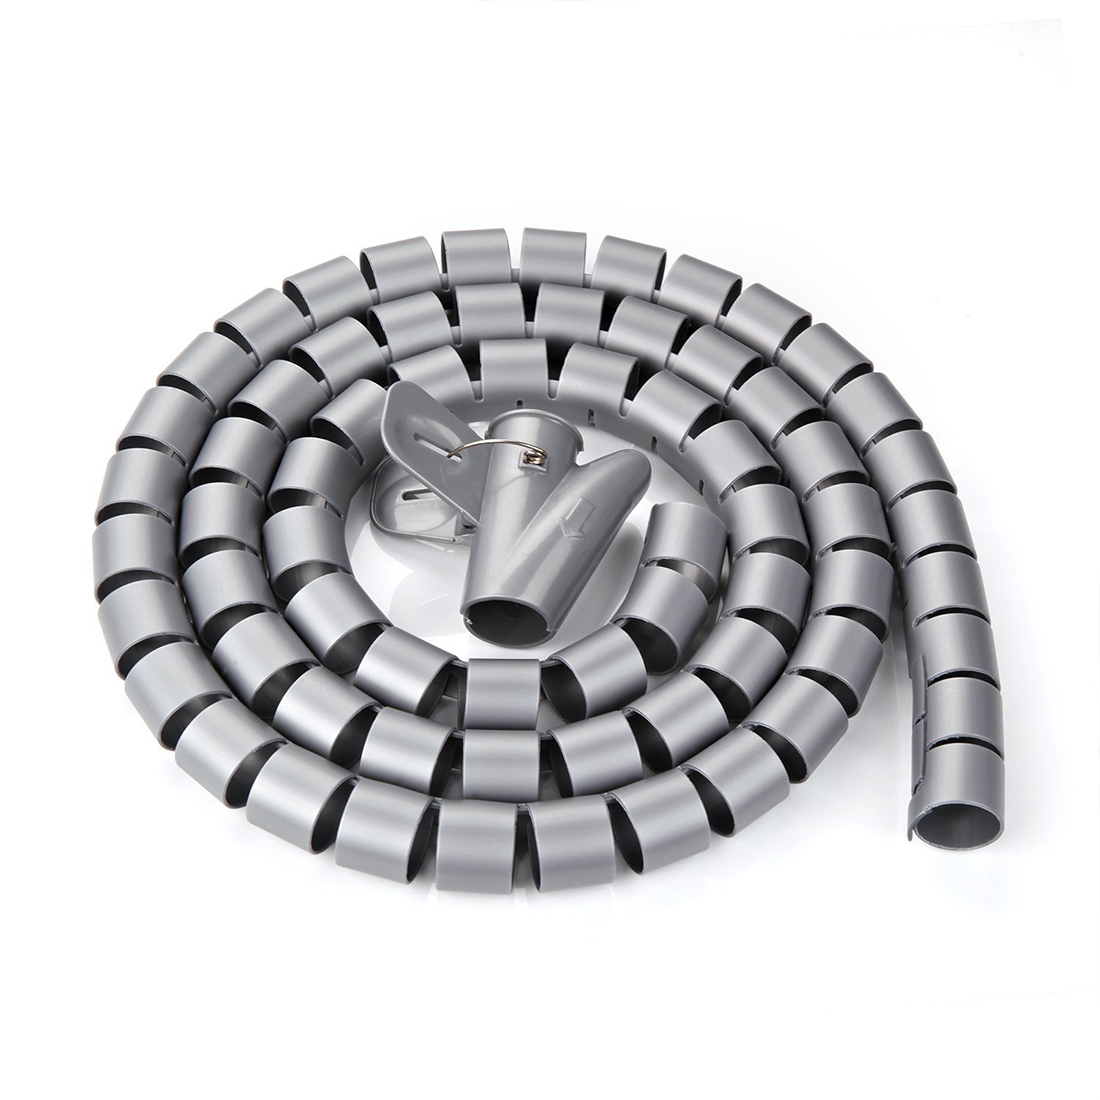 Unique Bargains 15mm Flexible Spiral Tube Cable Wire Wrap Computer Manage Cord Gray 5M w Clip